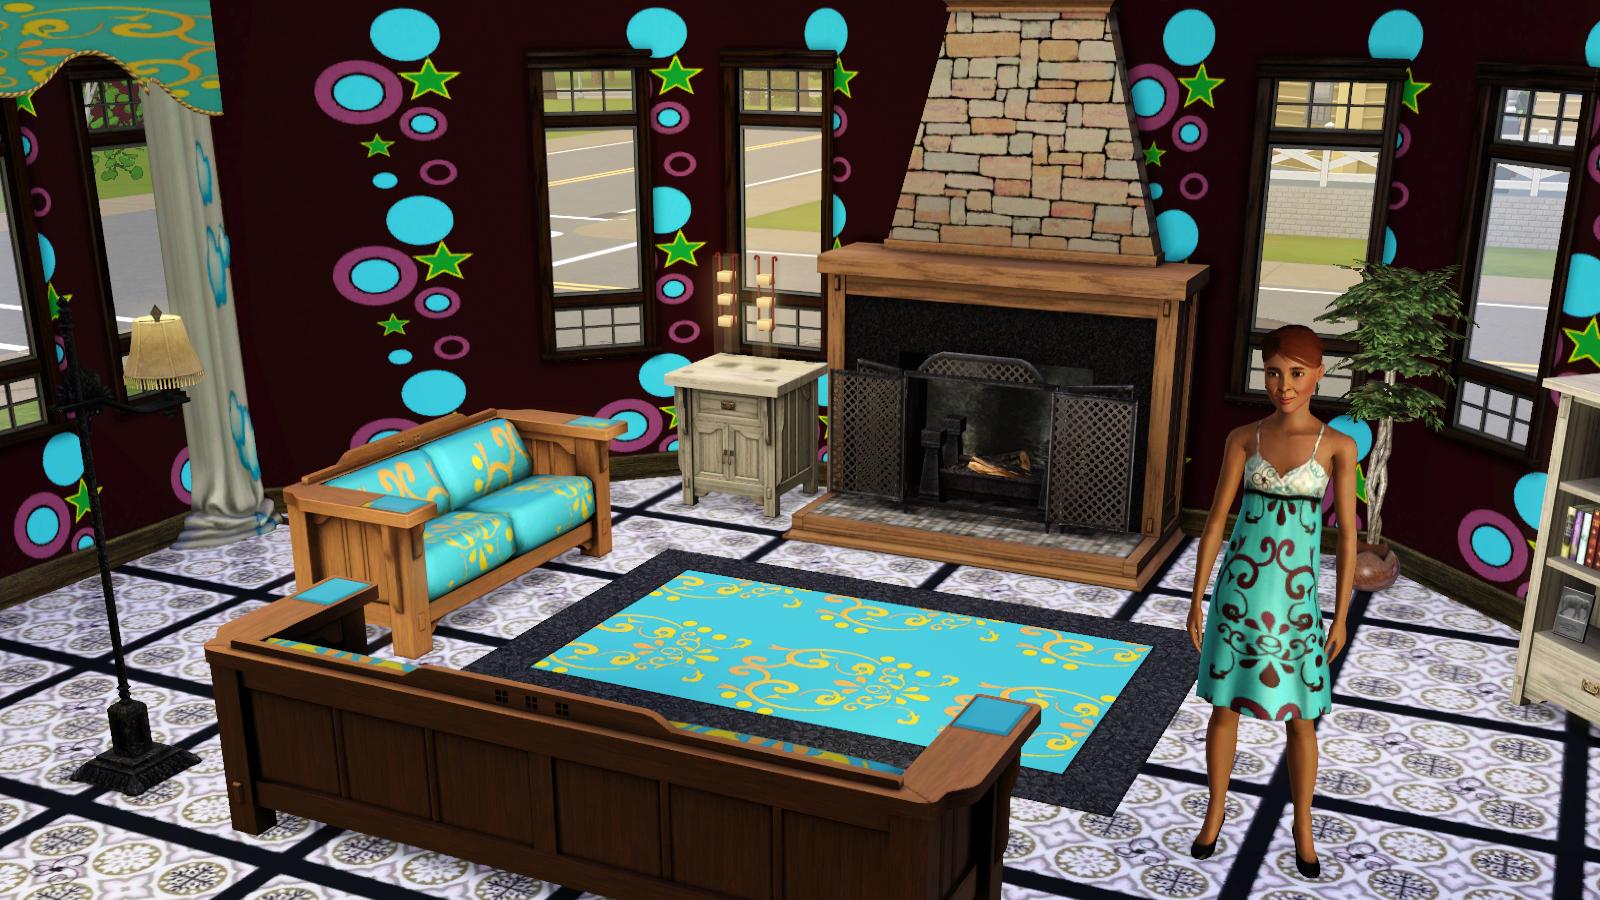 Sims 3 Egitto online dating foto